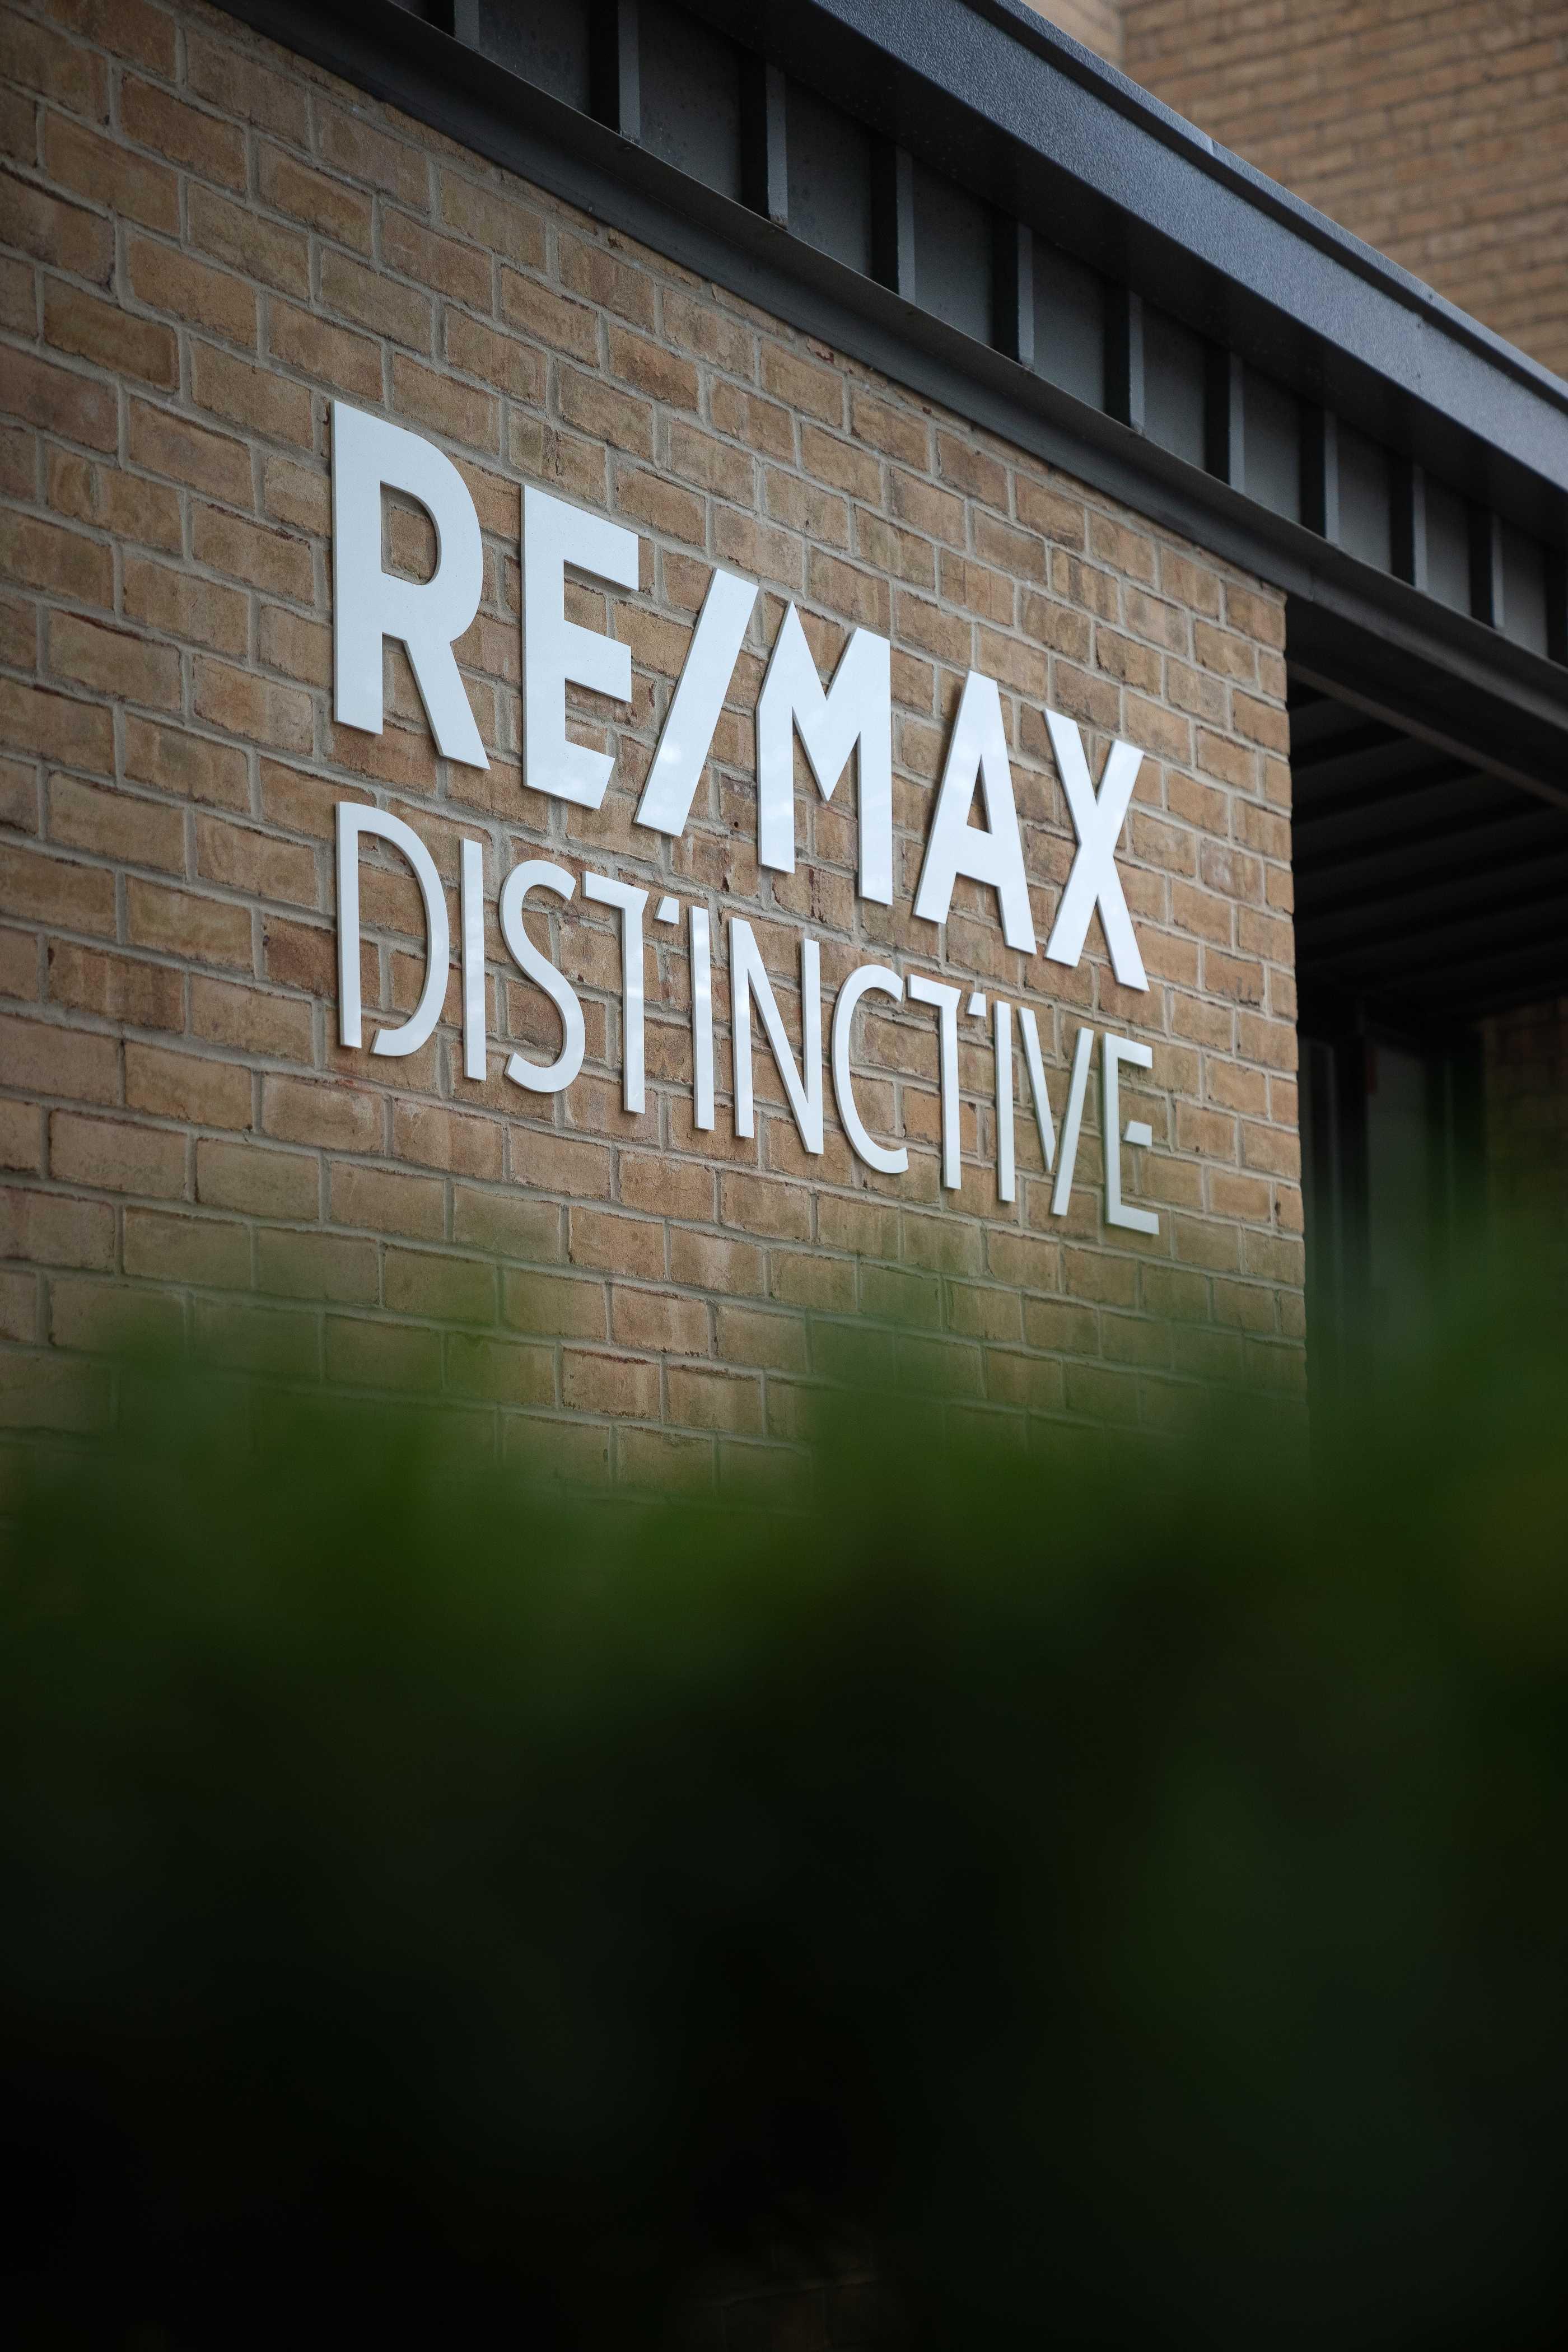 REMAX-Distinctive-Front-Office-1